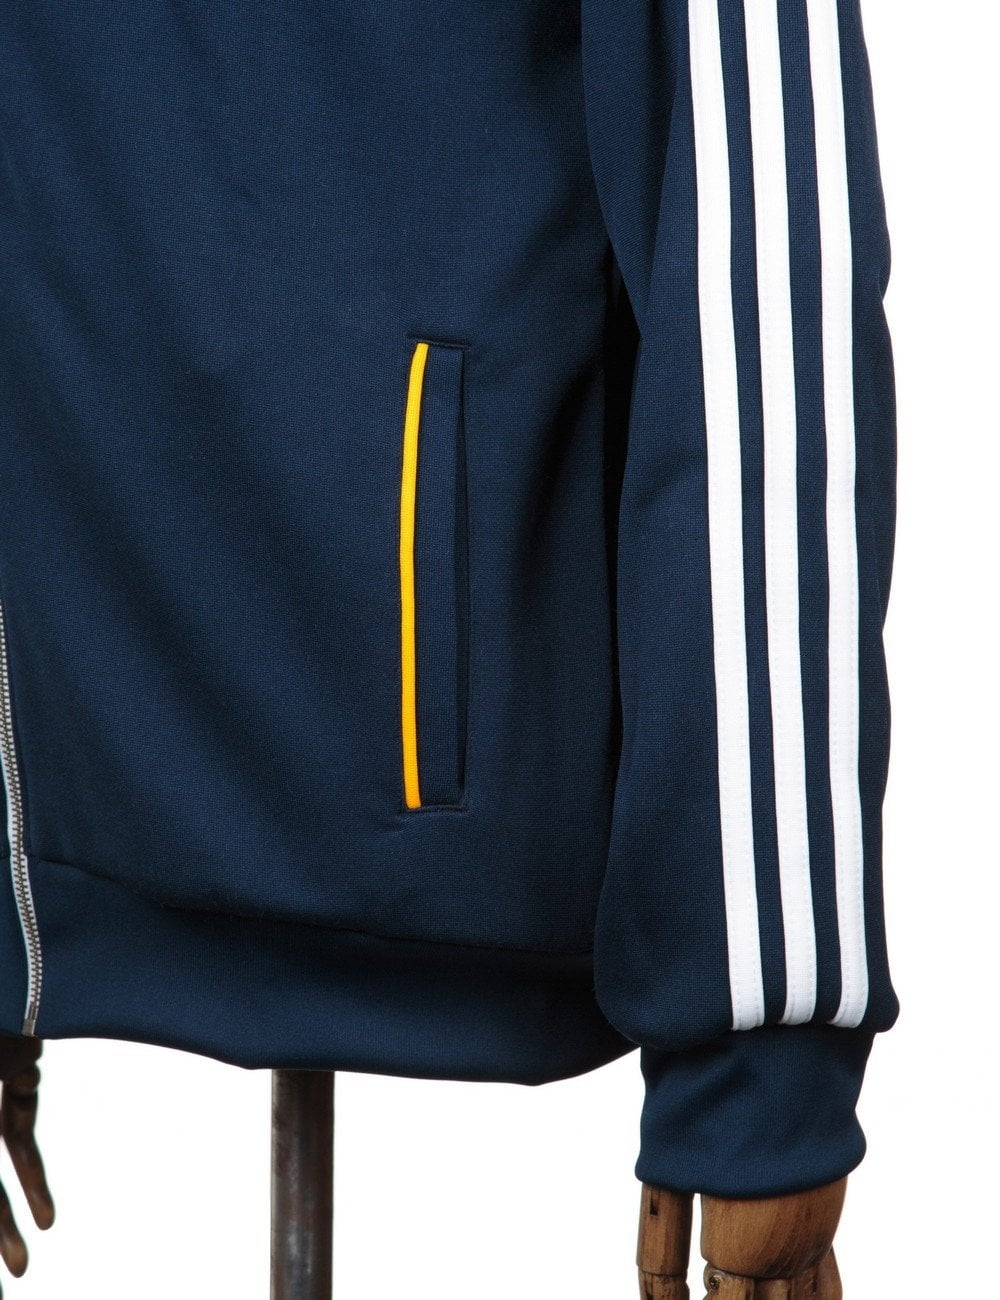 Shuraba ensayo Generalmente hablando  Adidas Originals SST Tracktop - Collegiate Navy - Clothing from Fat Buddha  Store UK